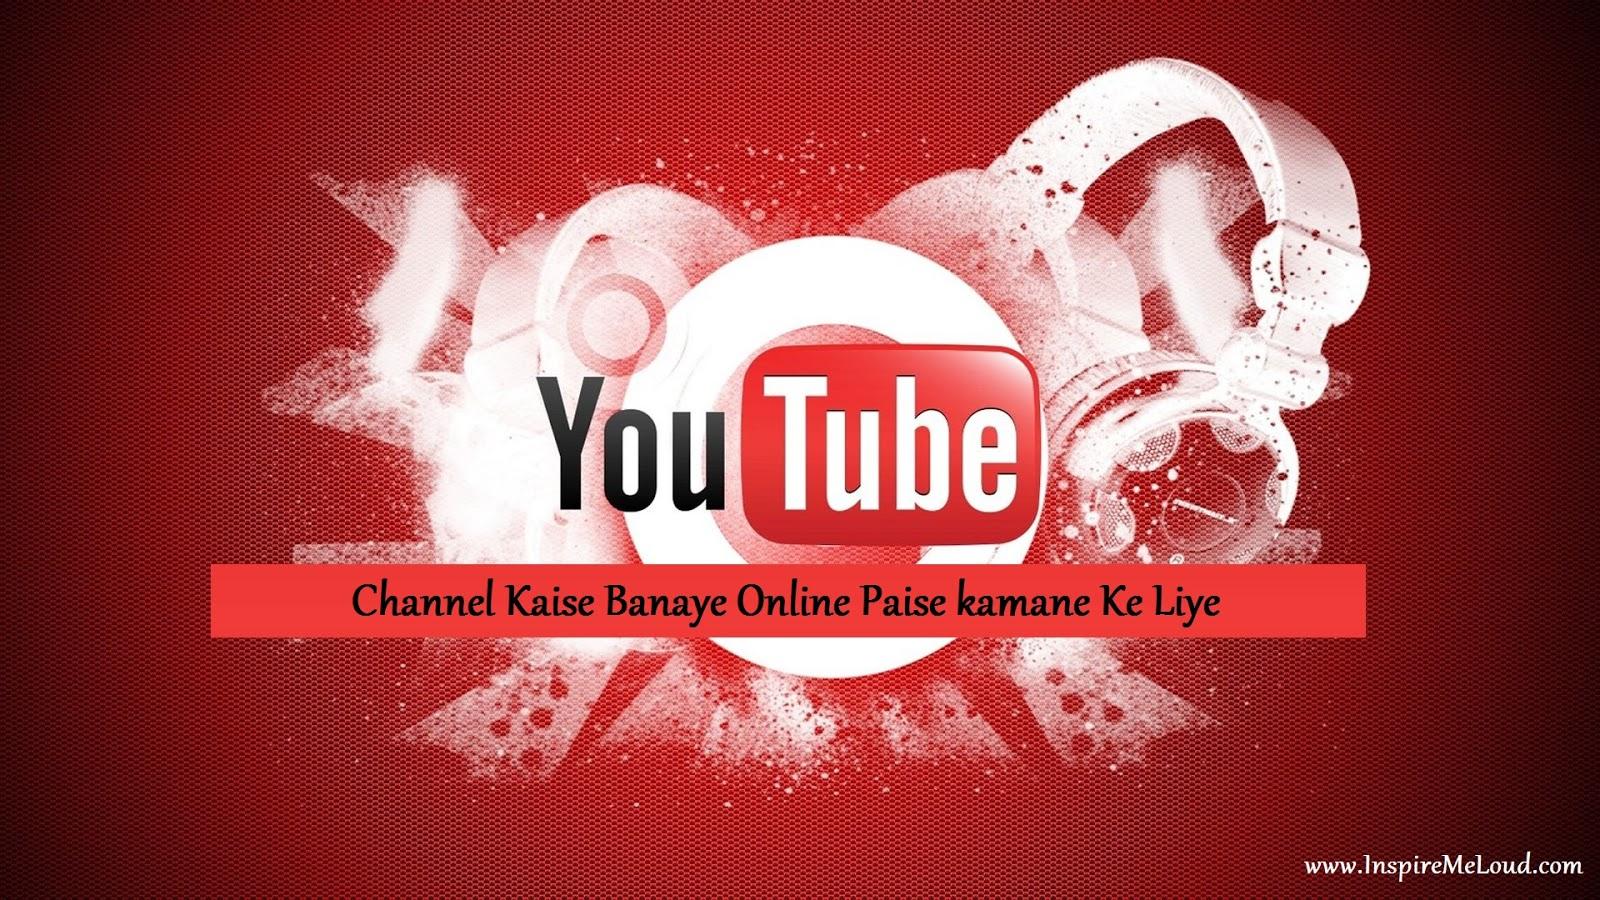 YouTube Channel Kaise Banaye Online Paise Kamane Ke Liye